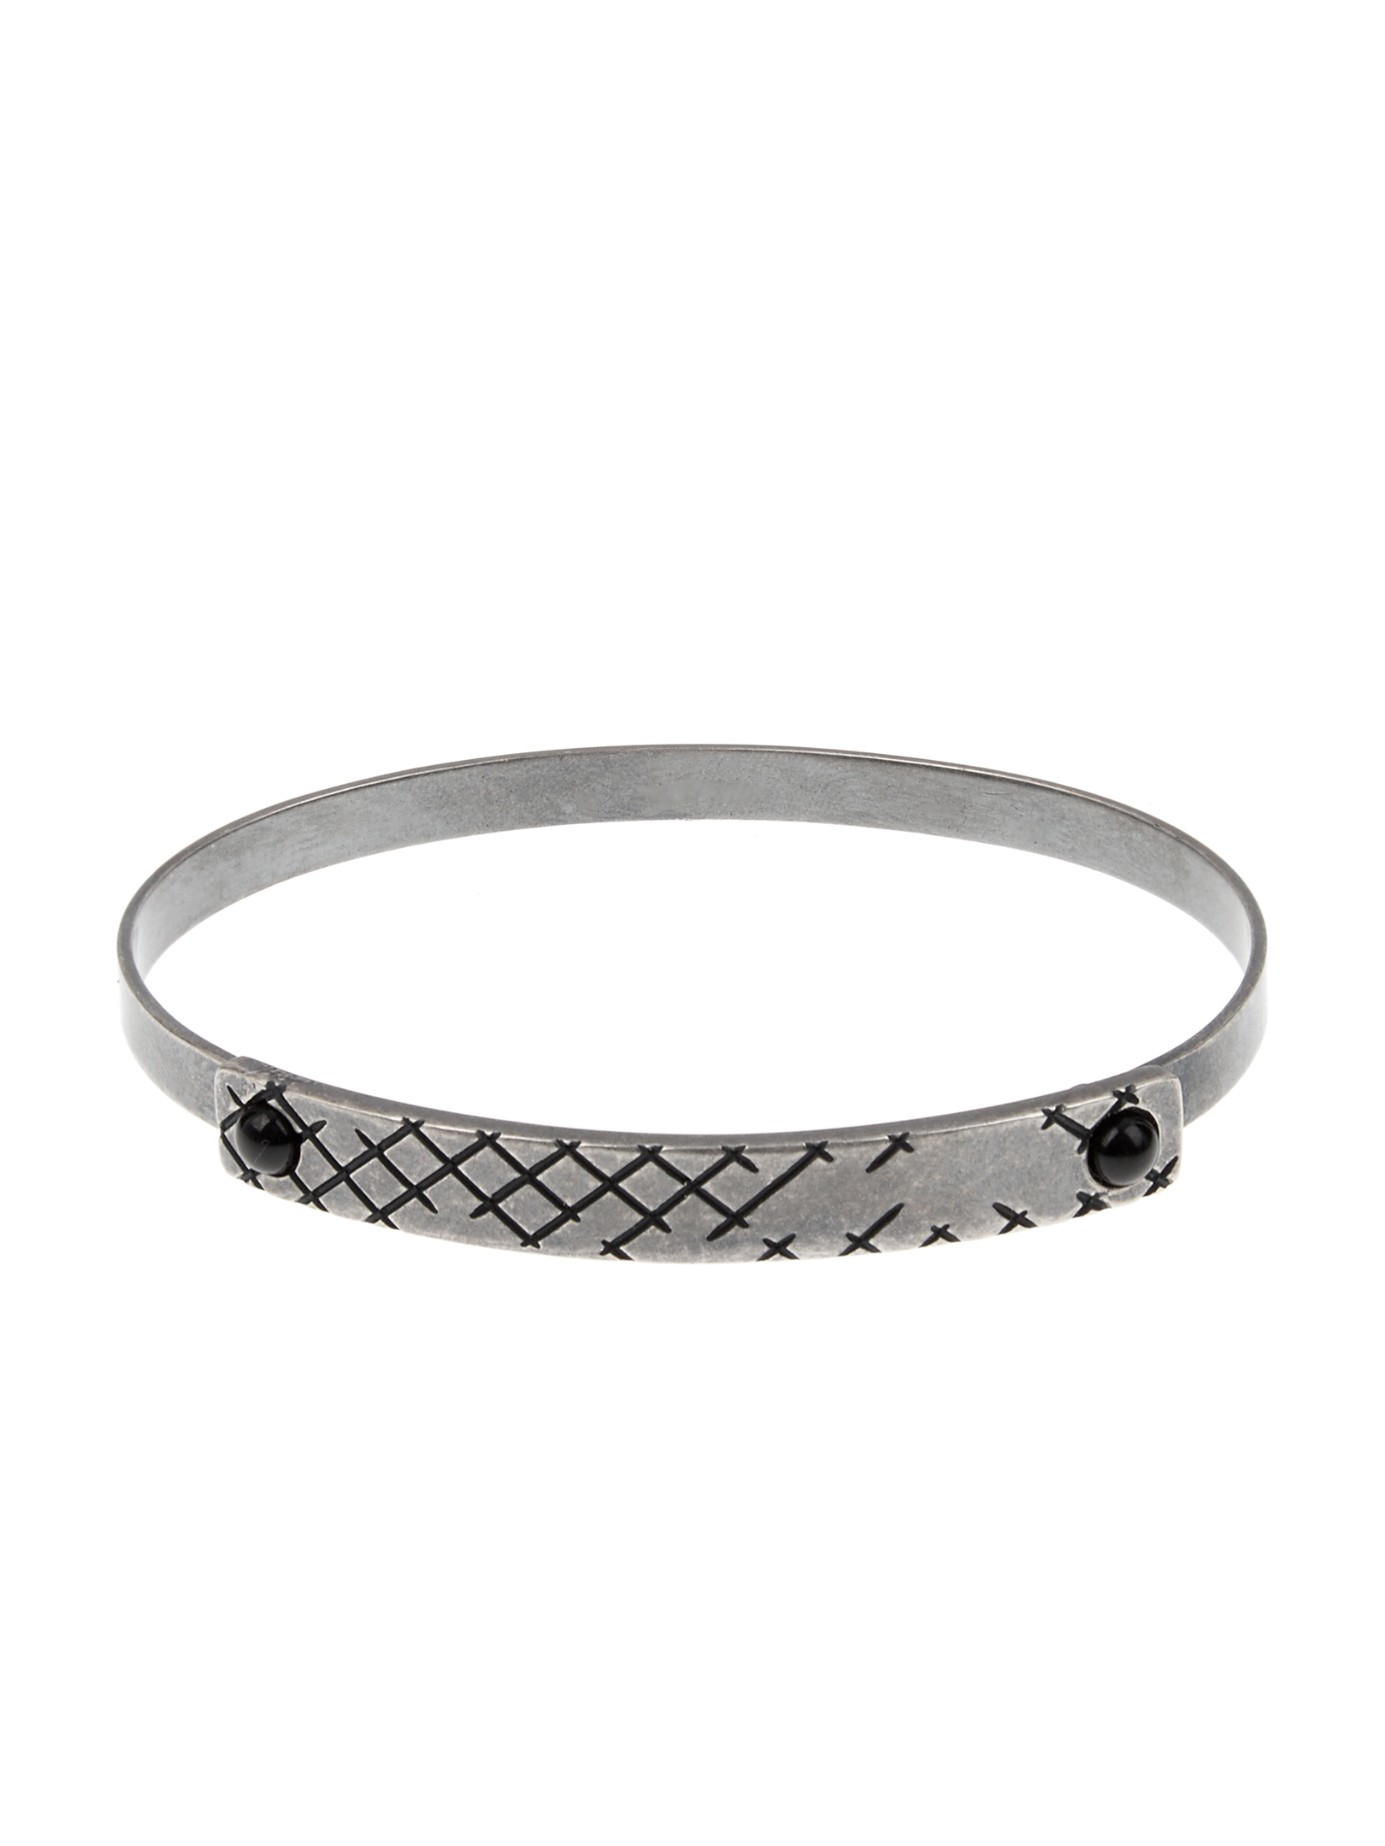 Bottega Veneta Intrecciato Leather And Oxidised Silver Bracelet - Black 8PuDQ